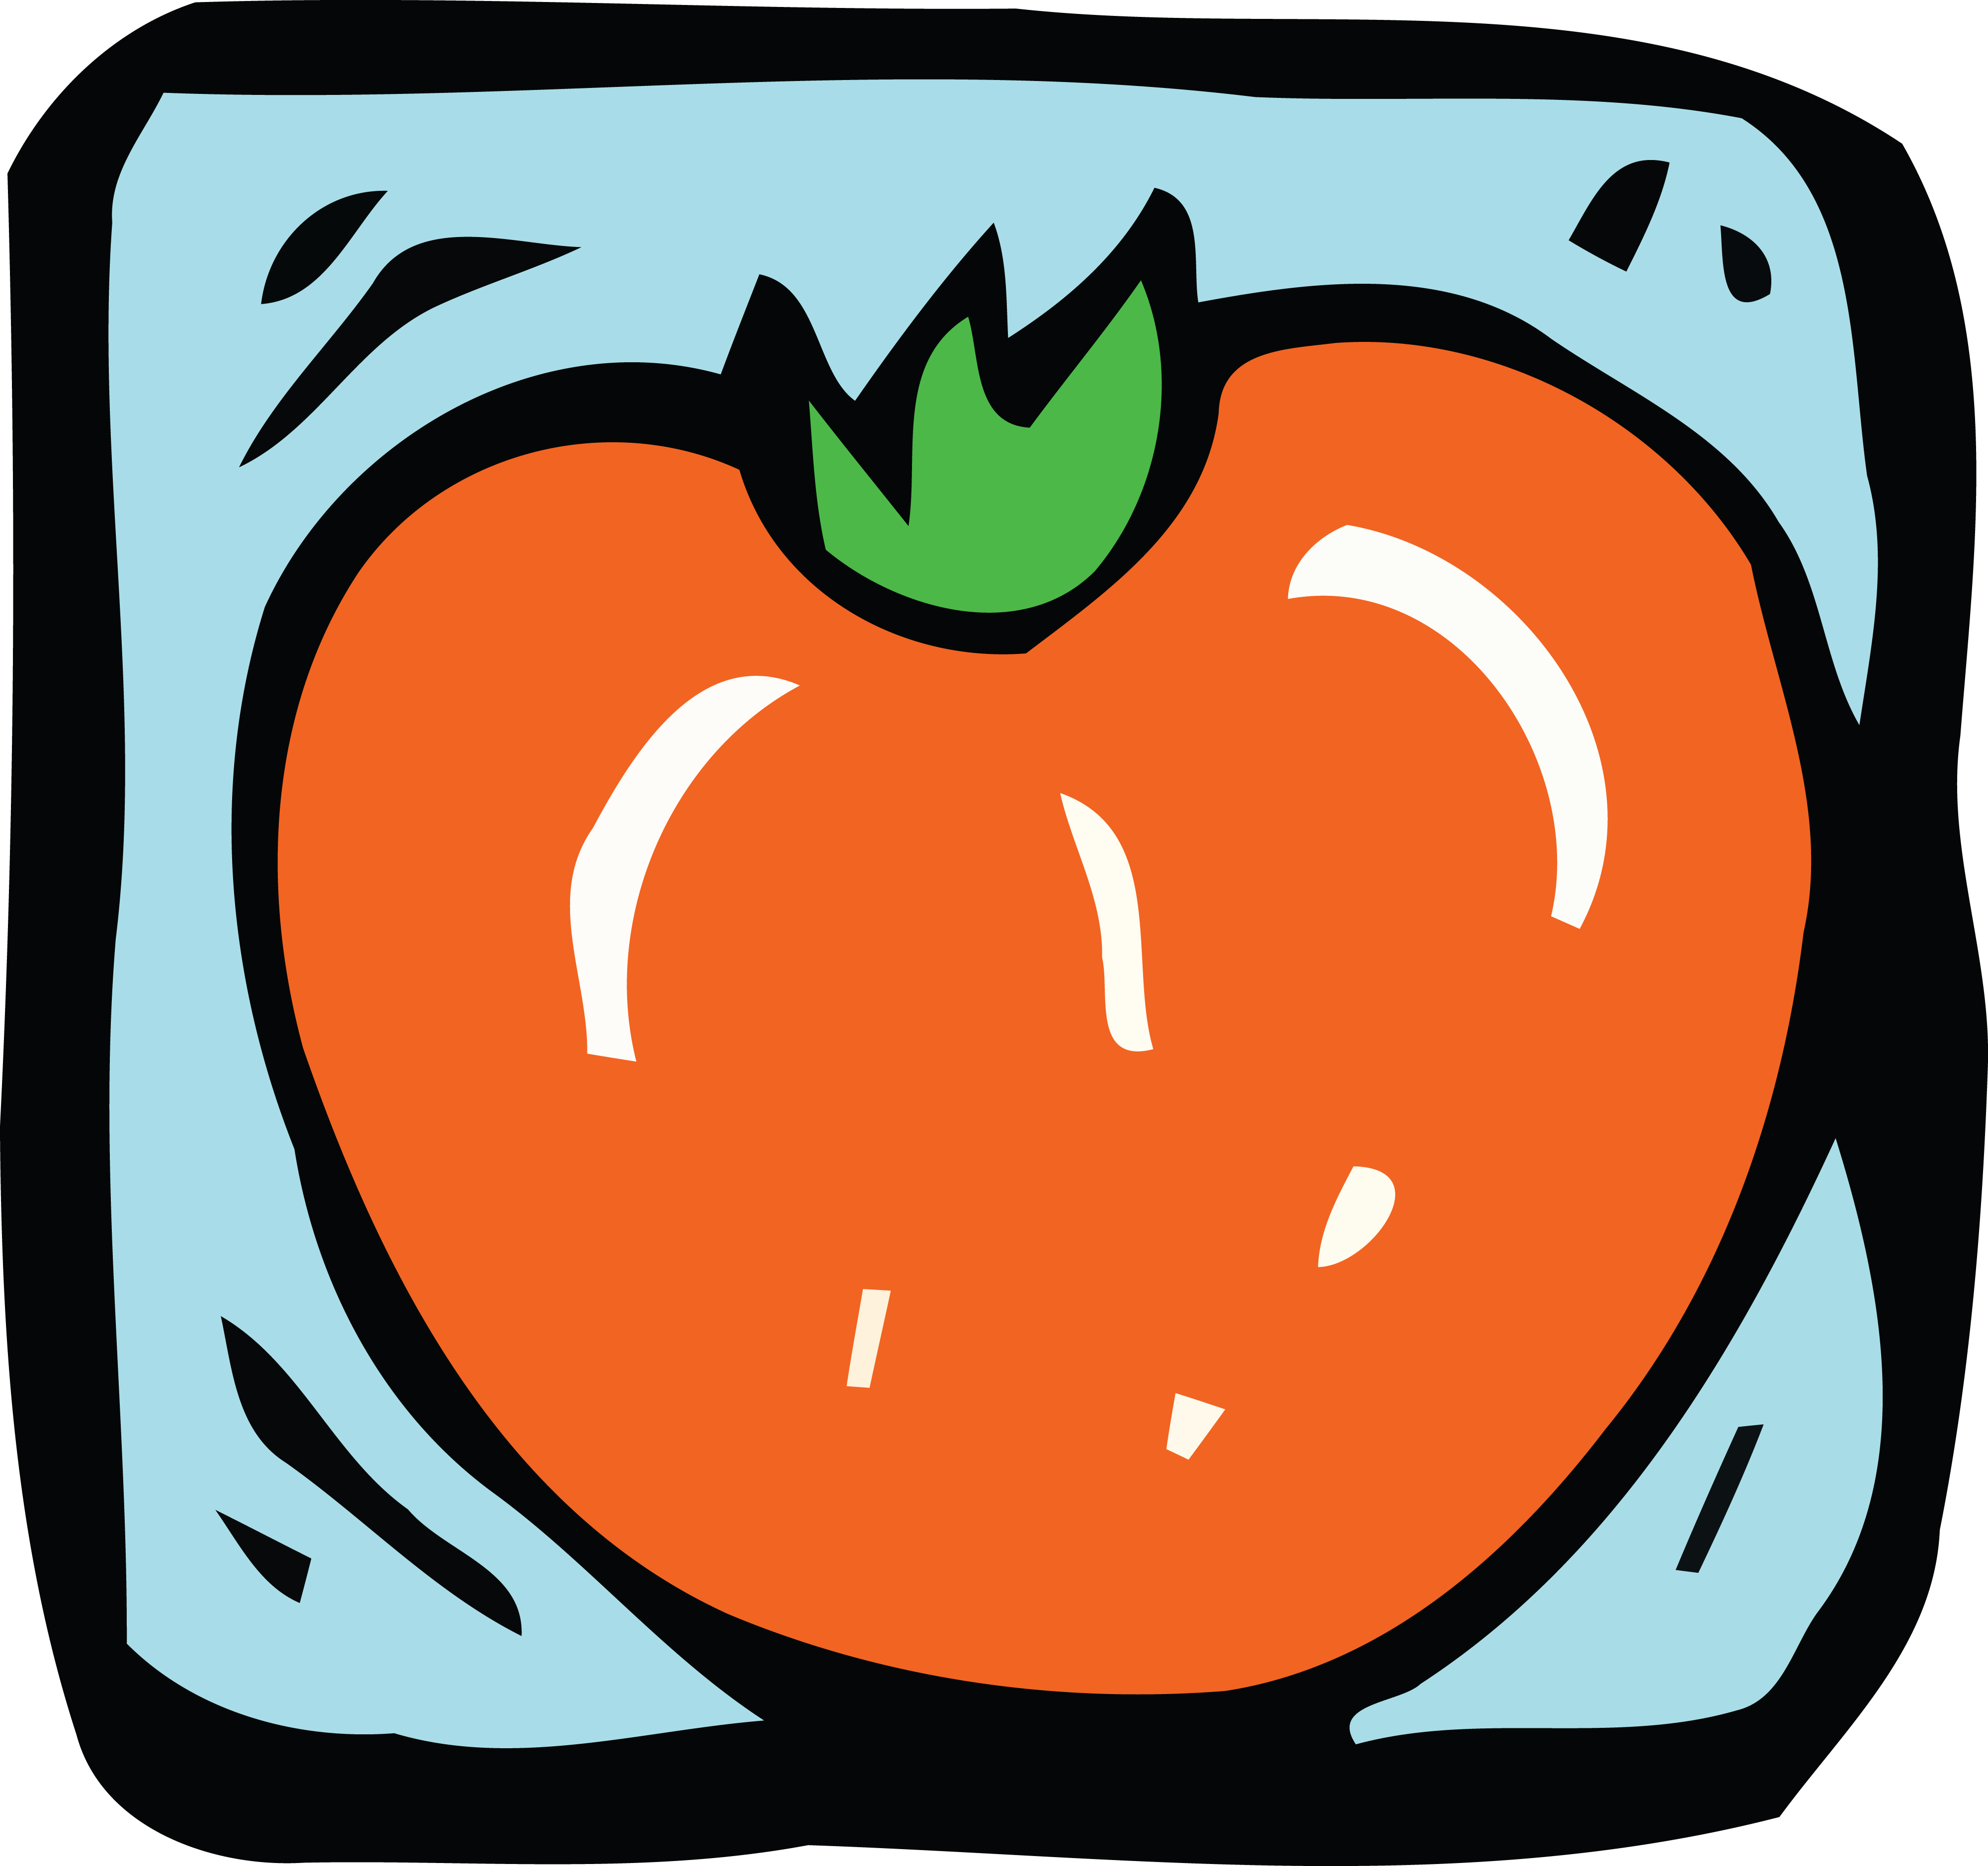 4000x3755 Clipart Of A Tomato